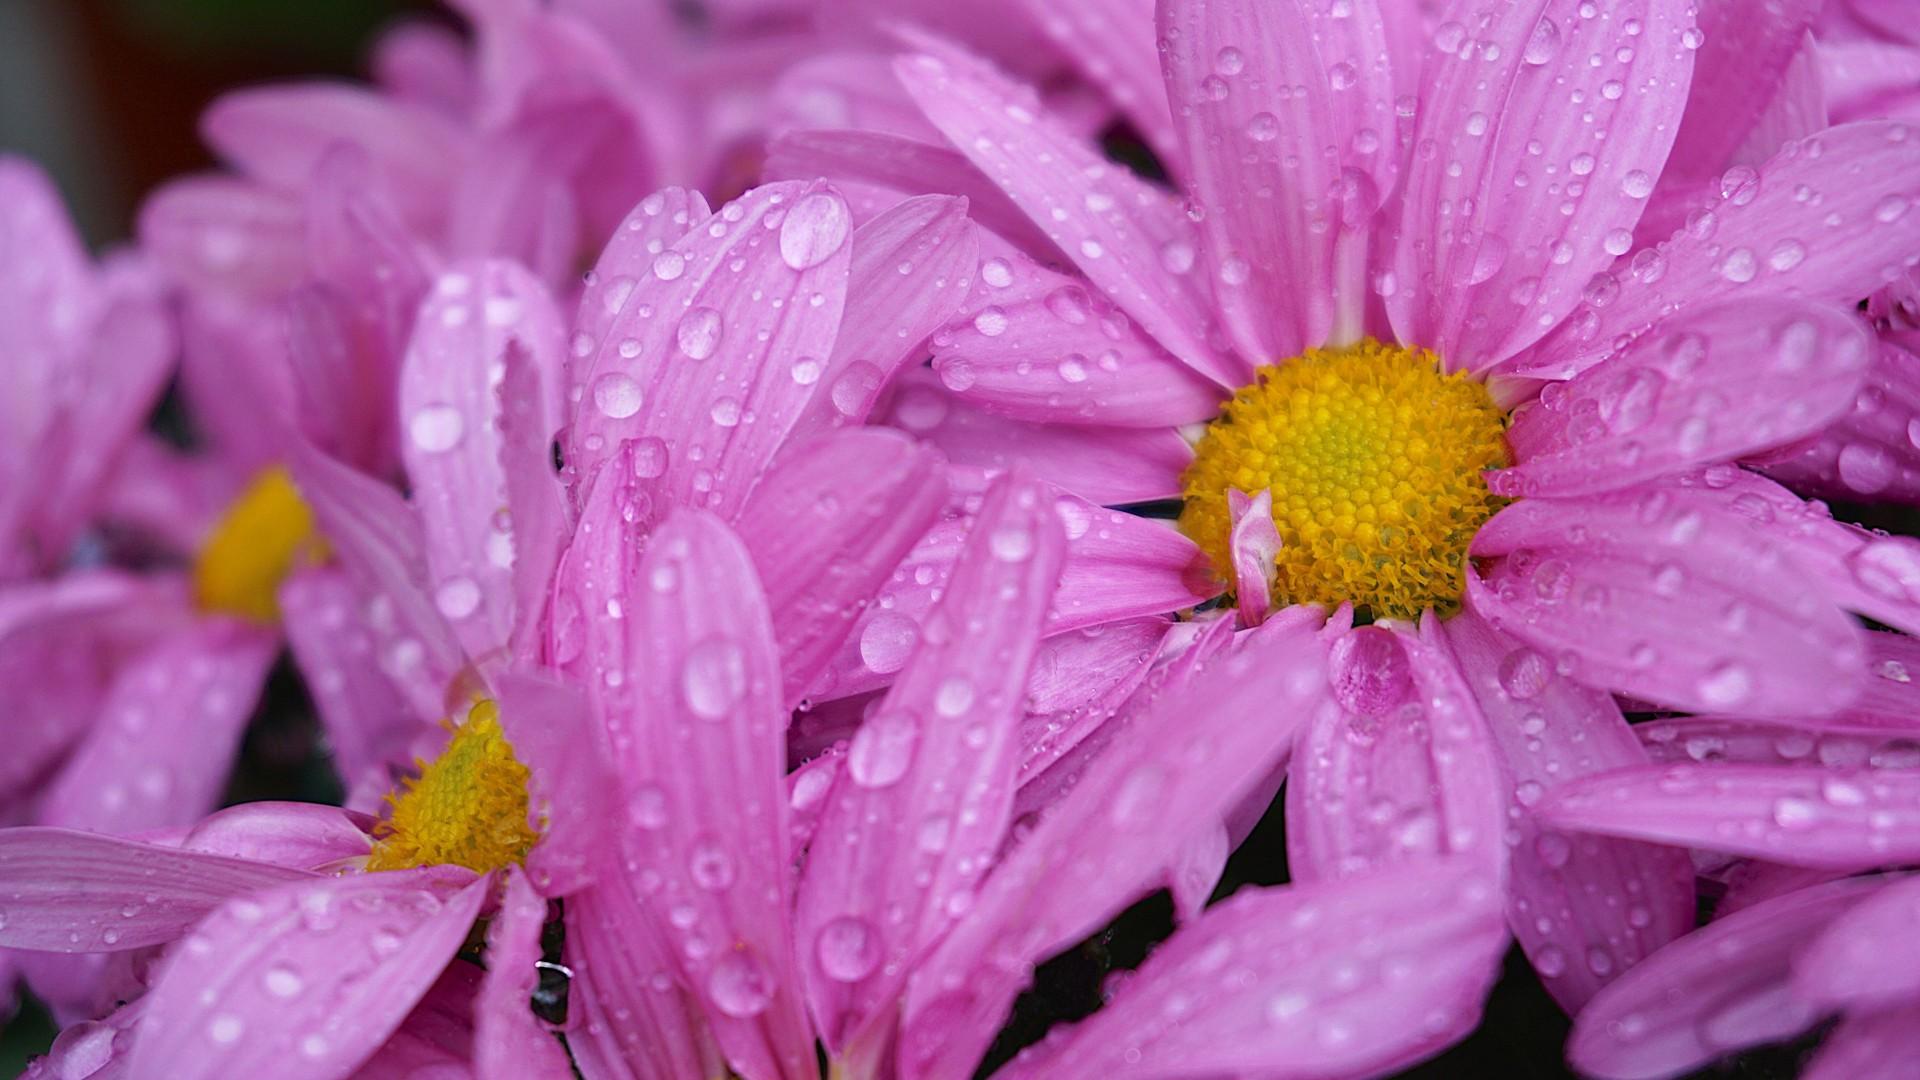 pink daisies flowers with water drop 4k HD flowers